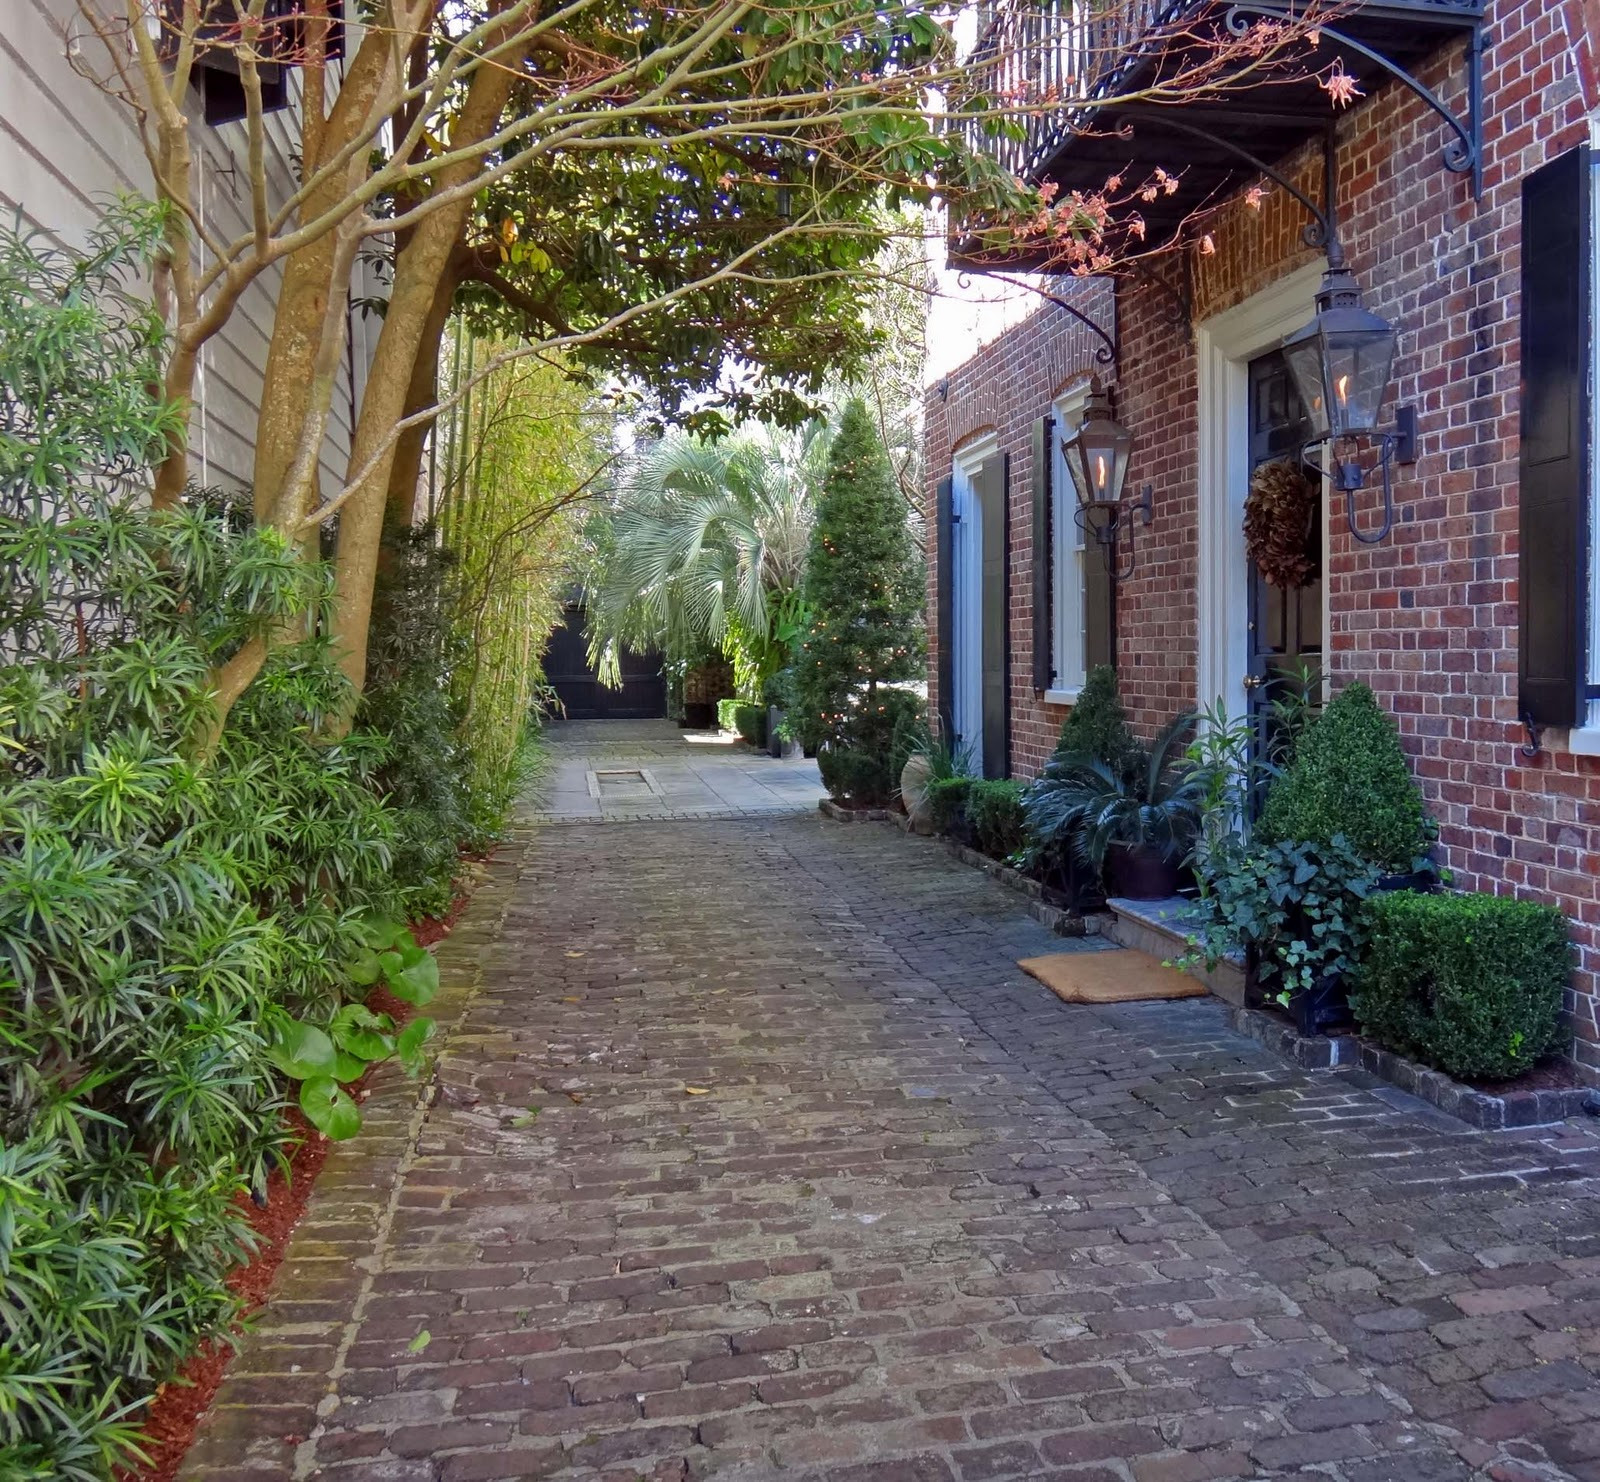 Wedding White Point Gardens Charleston Sc: Joe's Retirement Blog: Charleston, South Carolina, USA